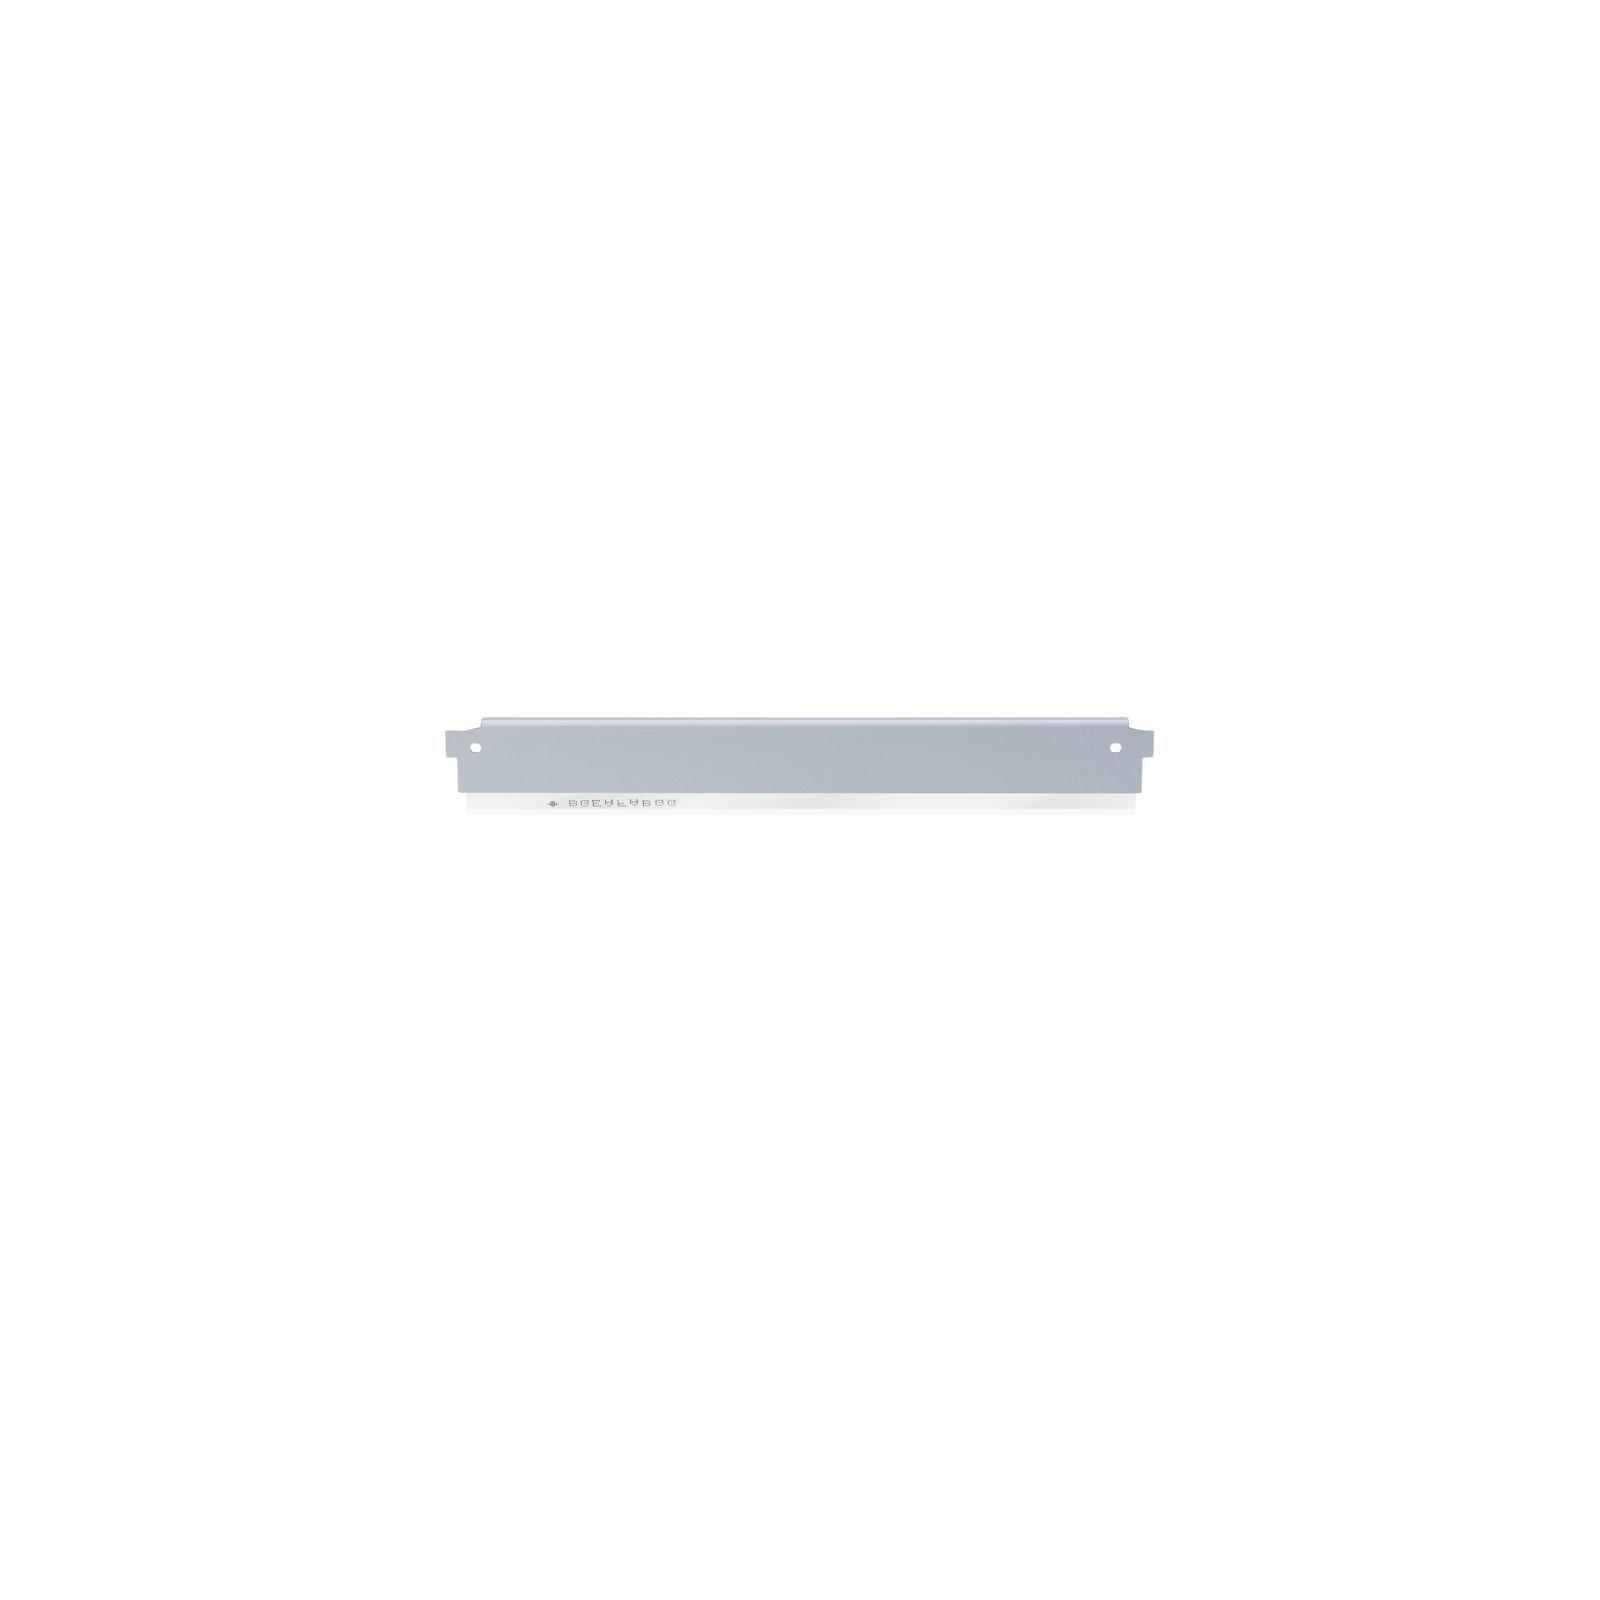 Чистящее лезвие SamsungML-4055/4550/4551/4555, Xerox Phaser3600 Static Control (D5330BLADE)